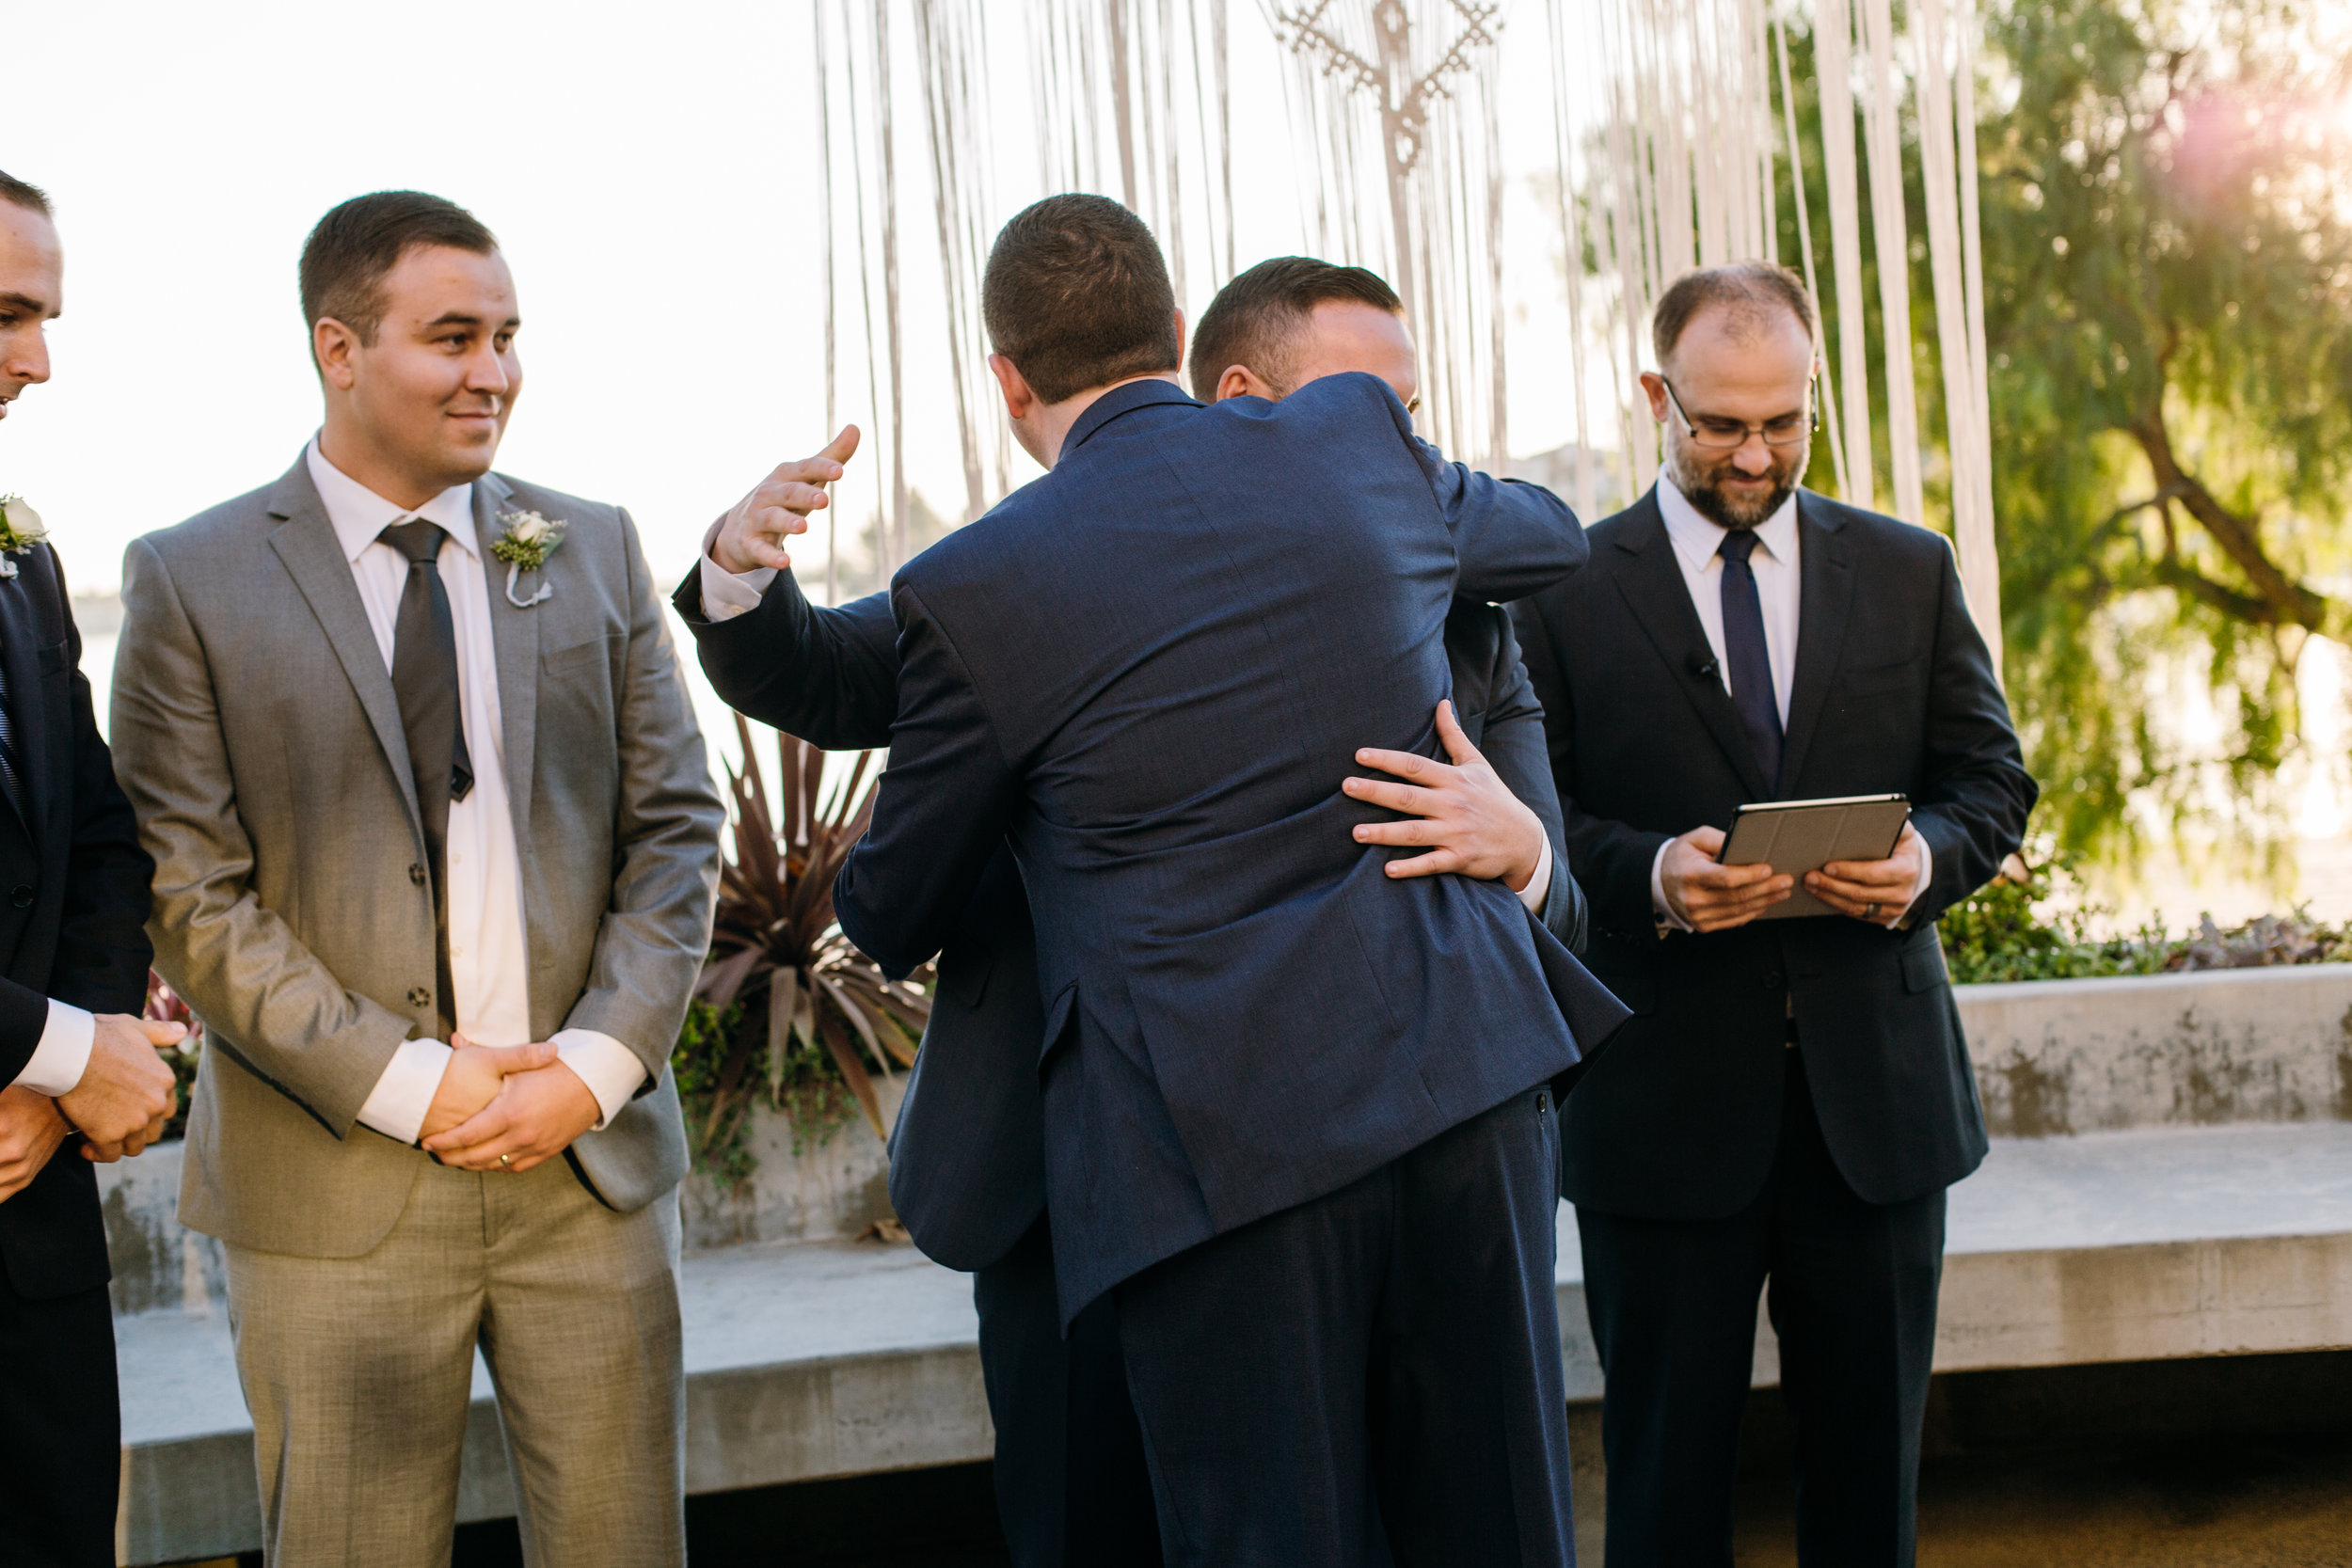 KaraNixonWeddings-DanaPoint-Wedding-22.jpg